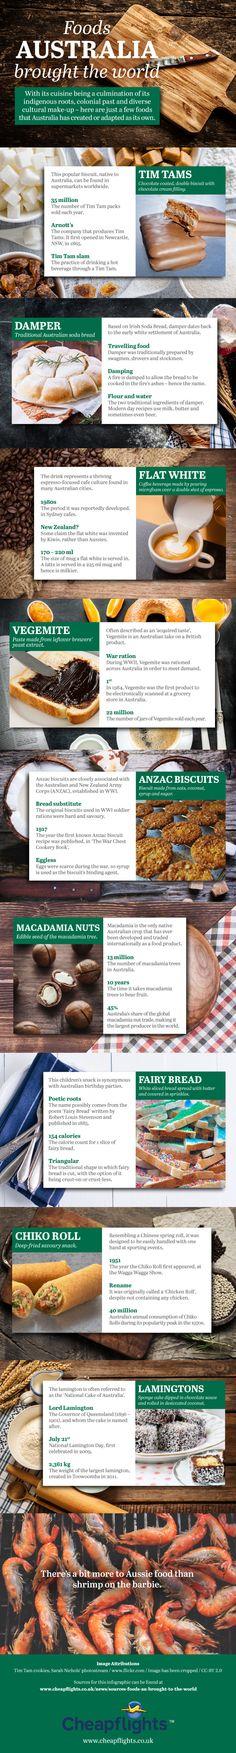 Foods that Australia Brought the World #infographic #Food #Australia